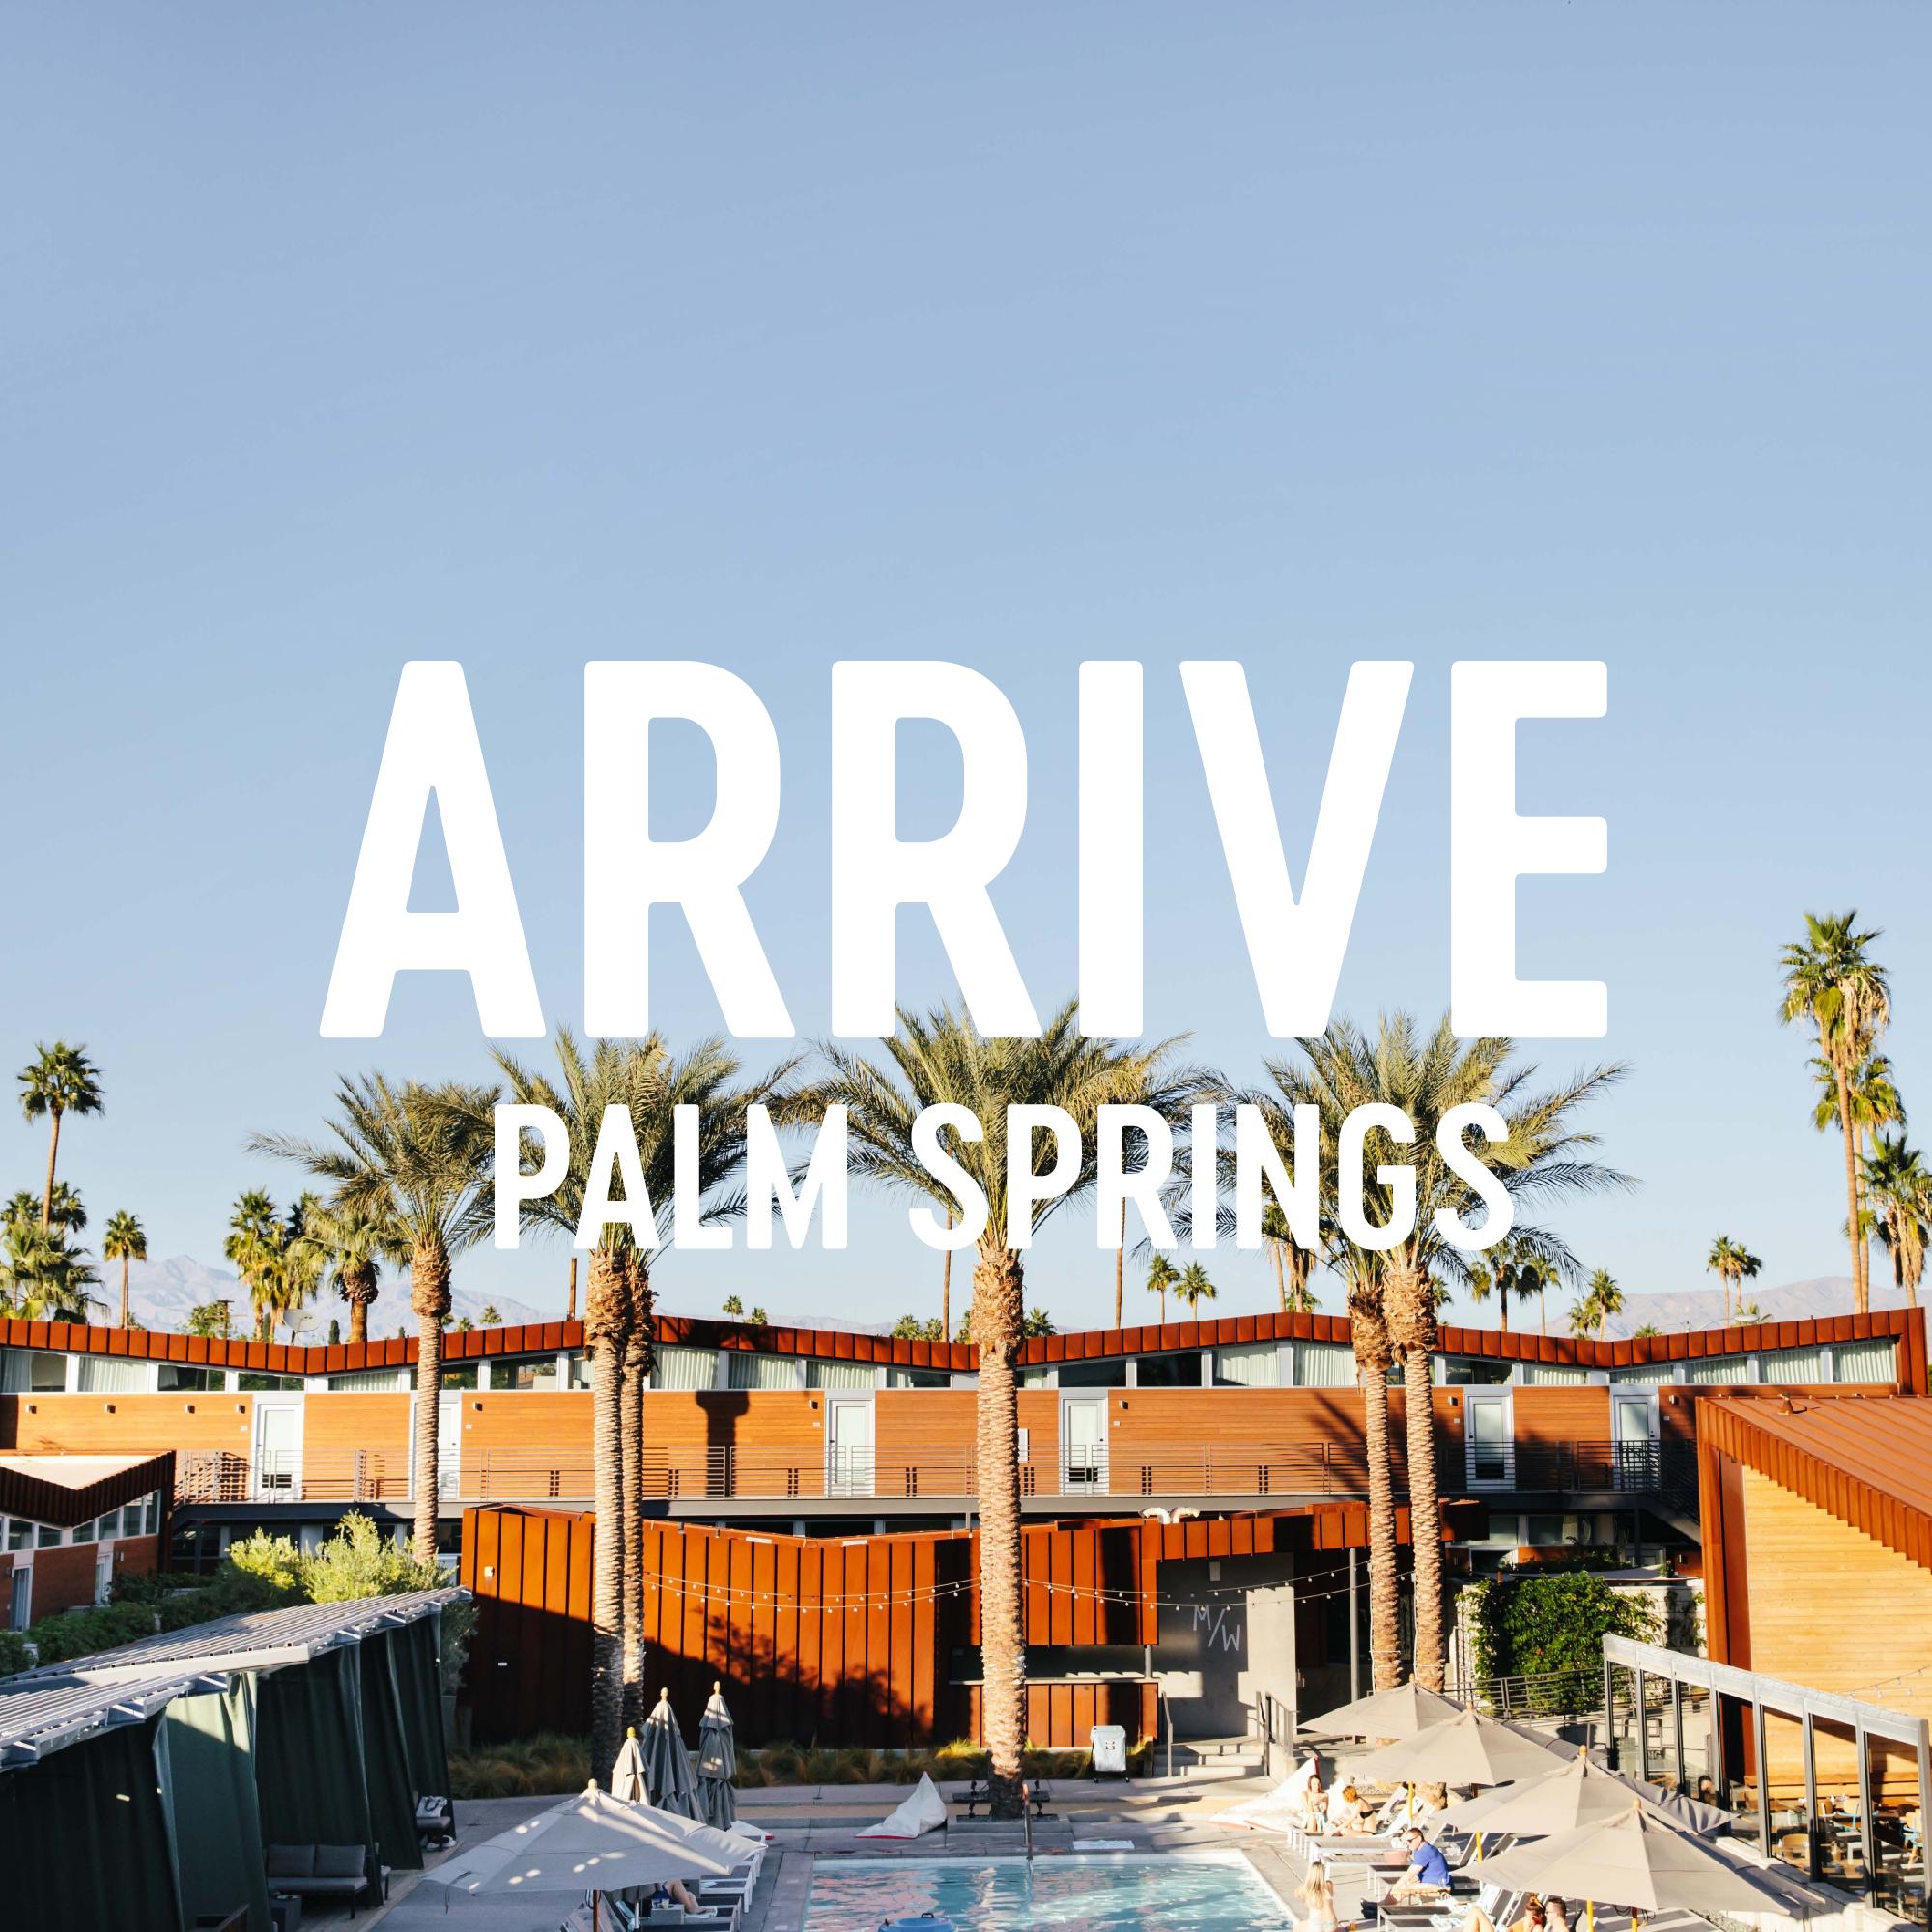 arrive_palmsprings_thumbnail.jpg